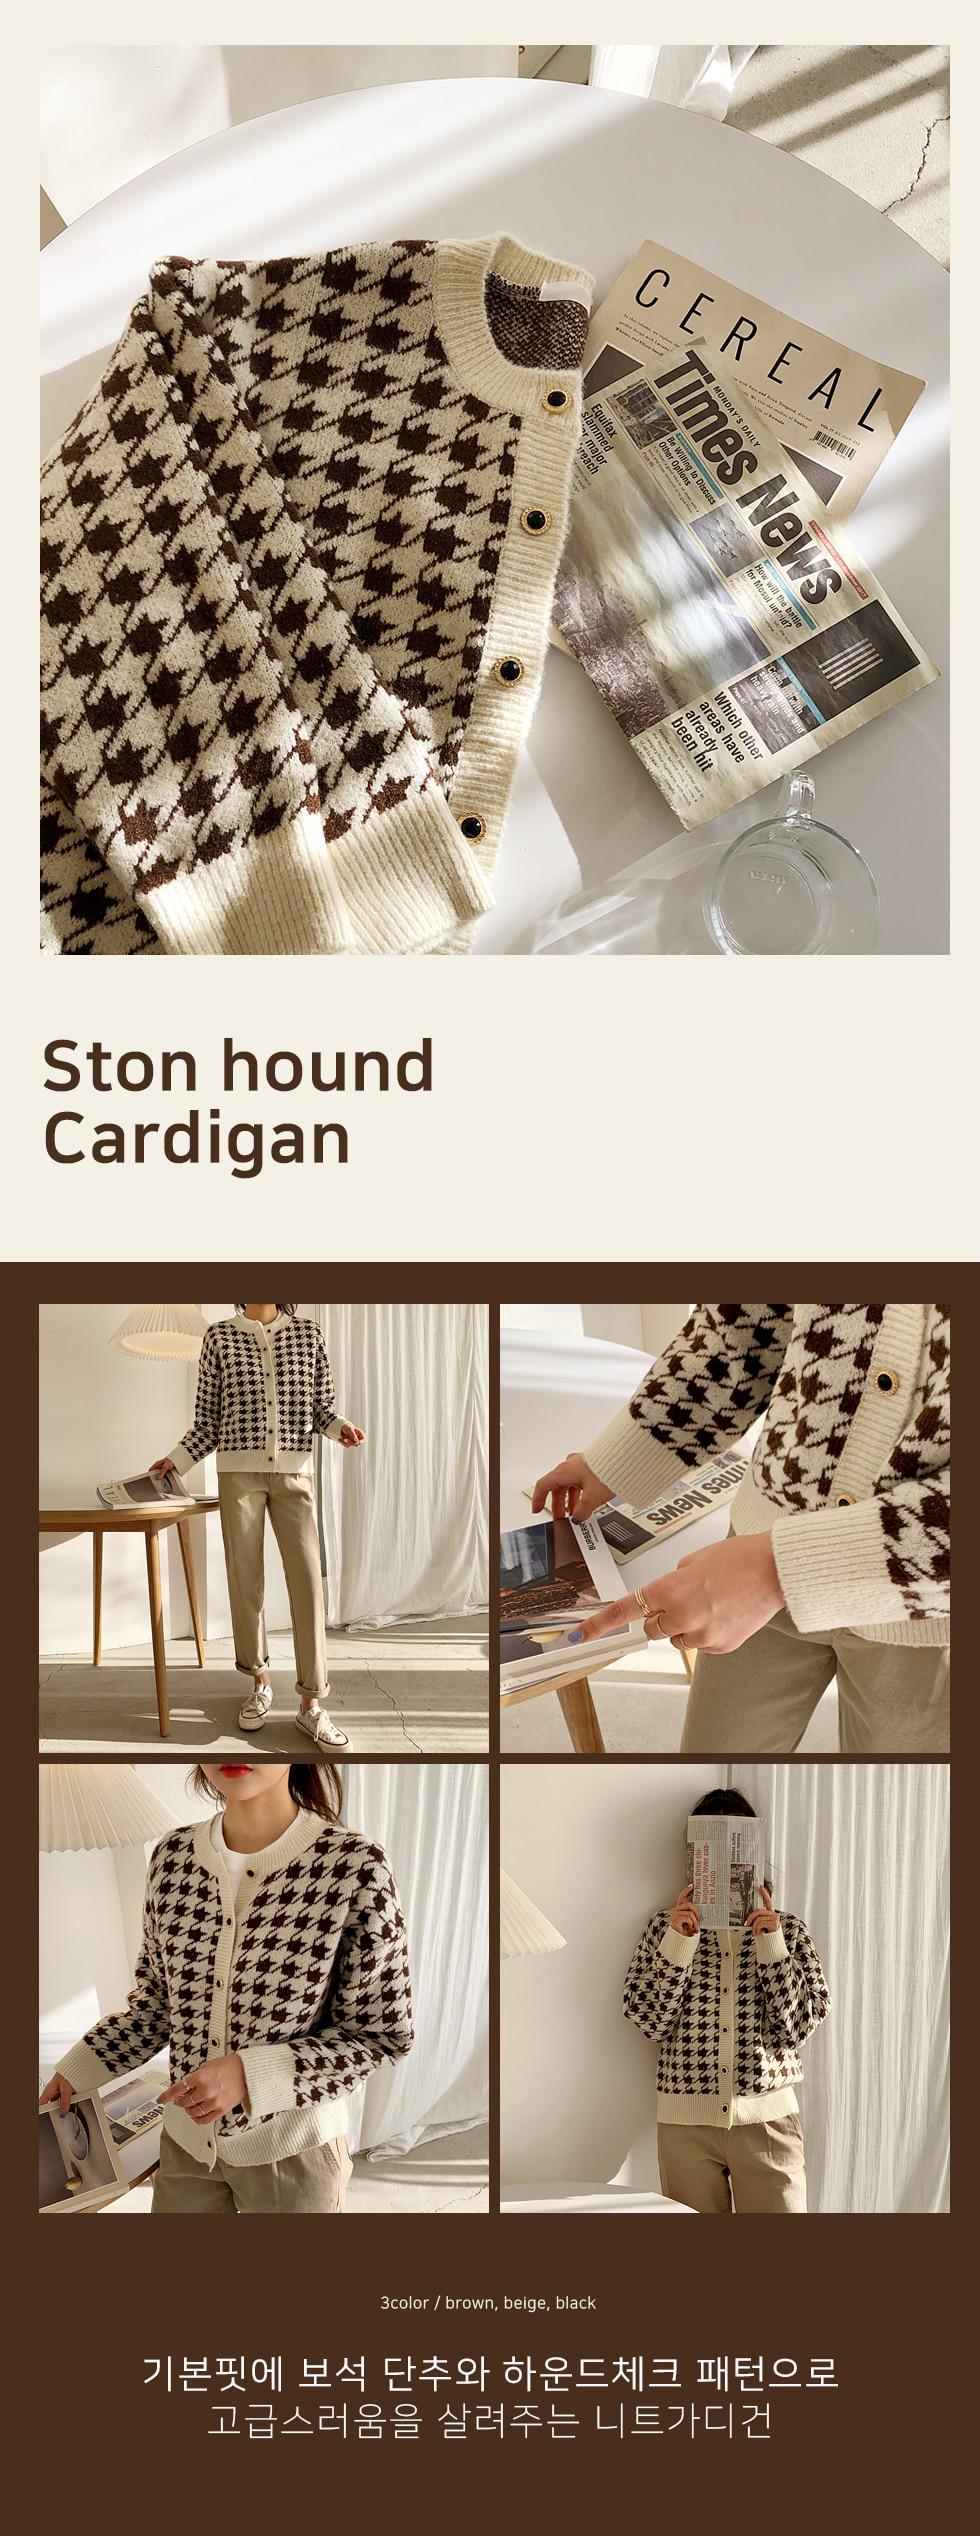 Stonehound Cardigan